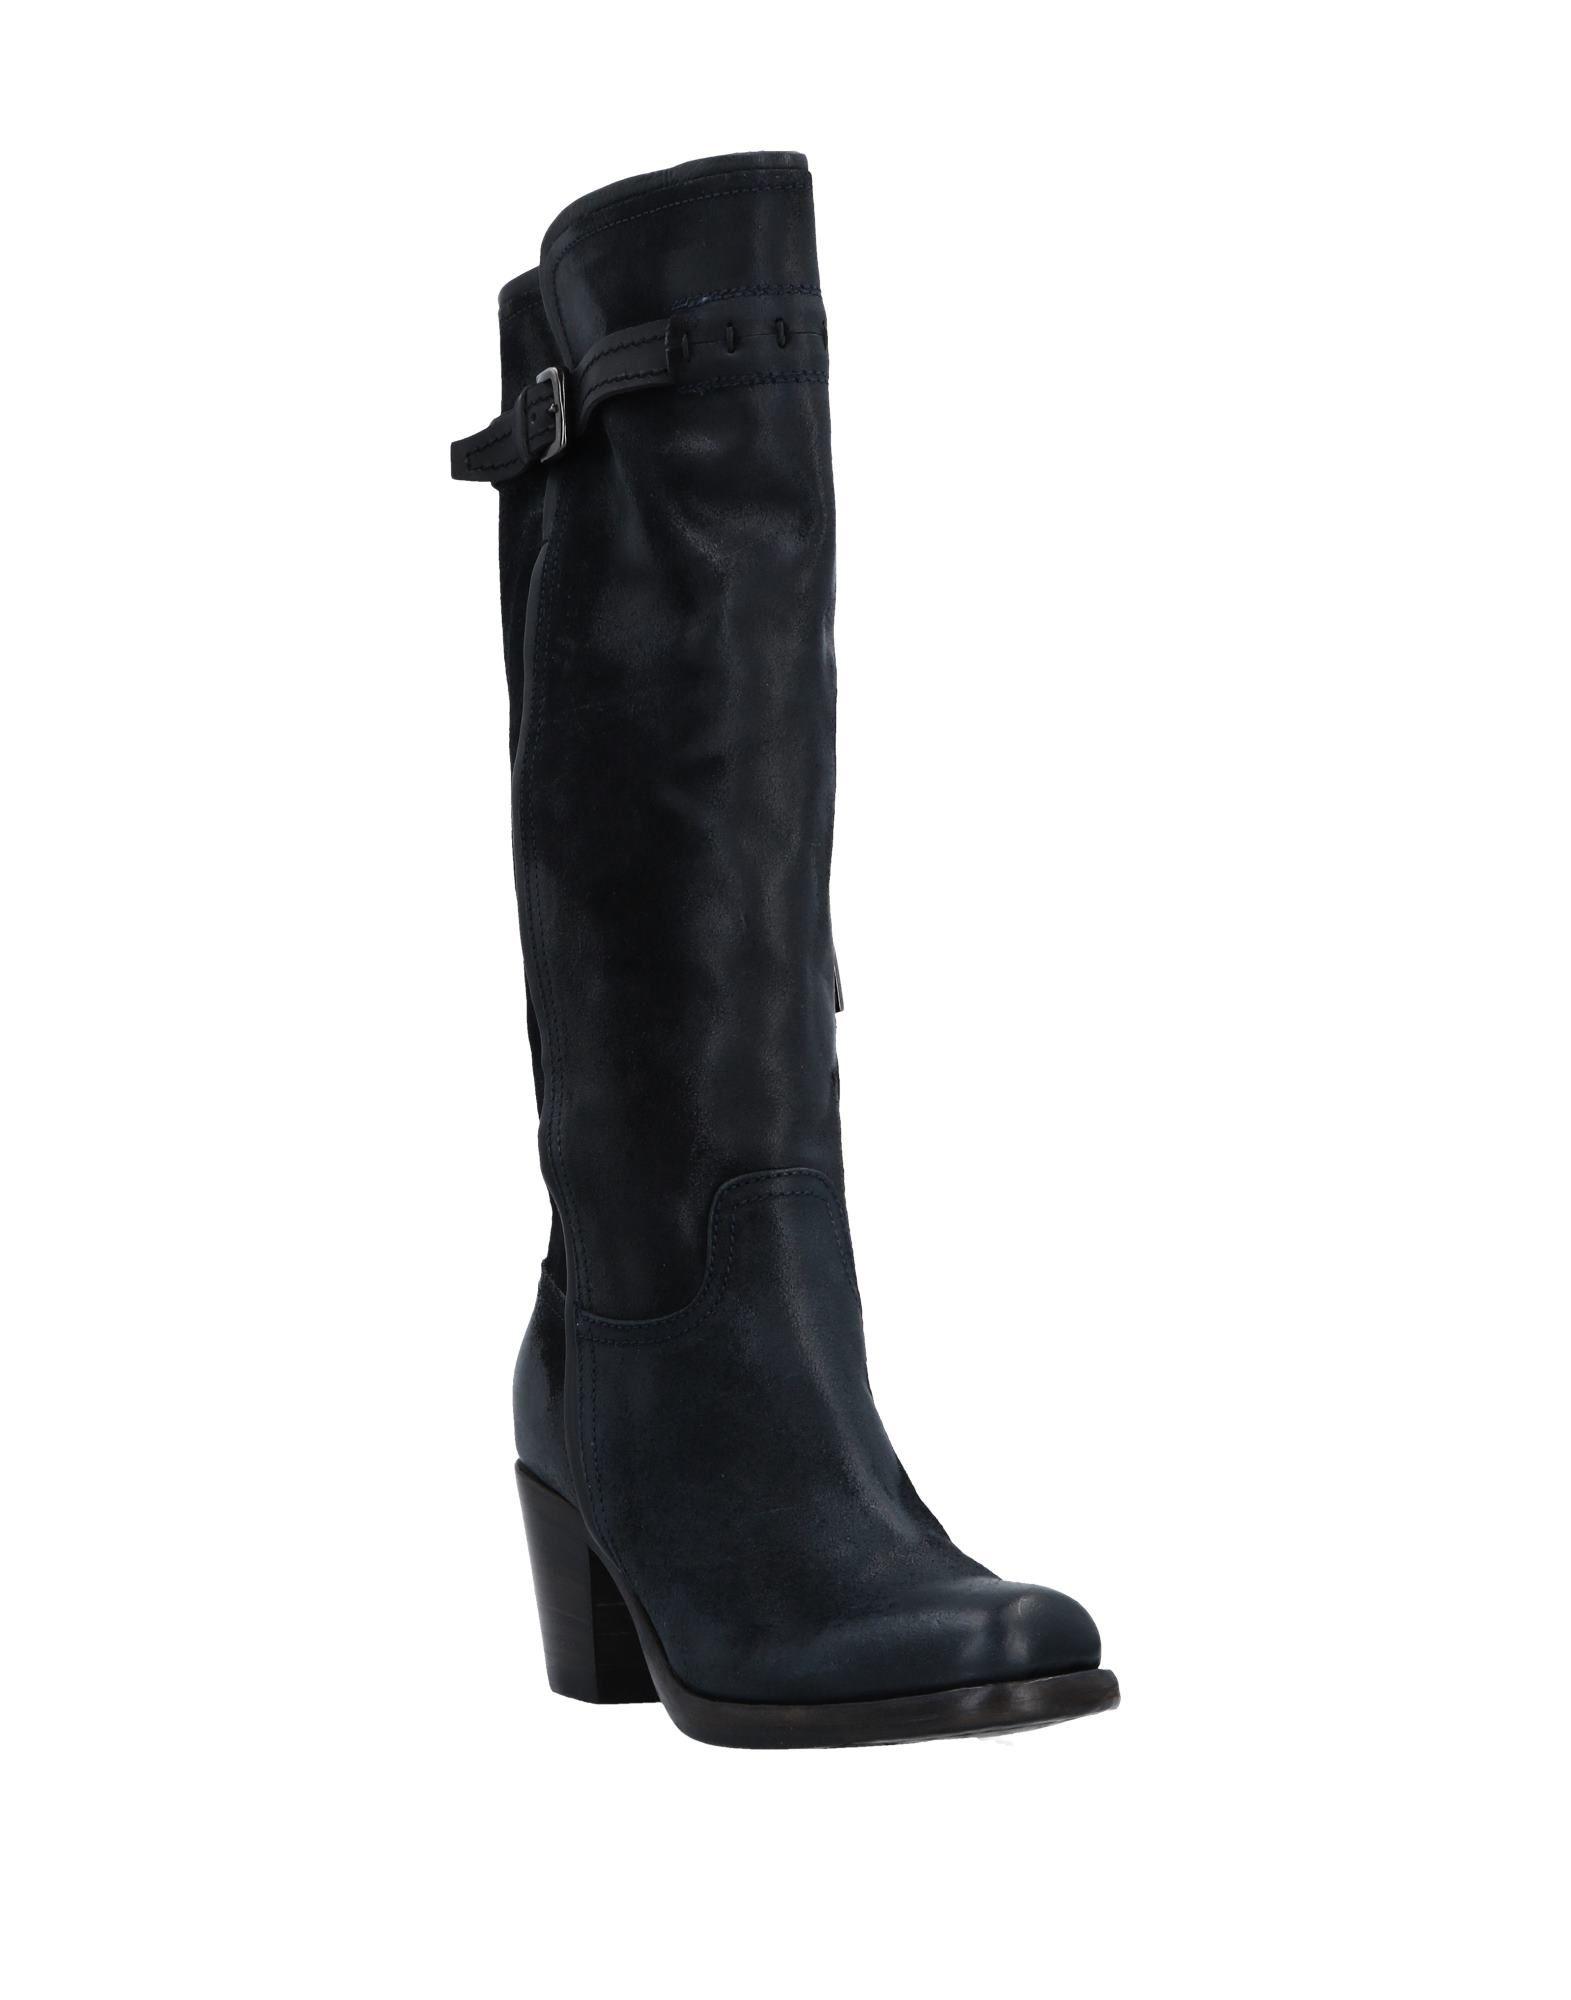 Rabatt Schuhe Pantanetti Stiefel Damen Damen Damen  11514511DP 276f2d